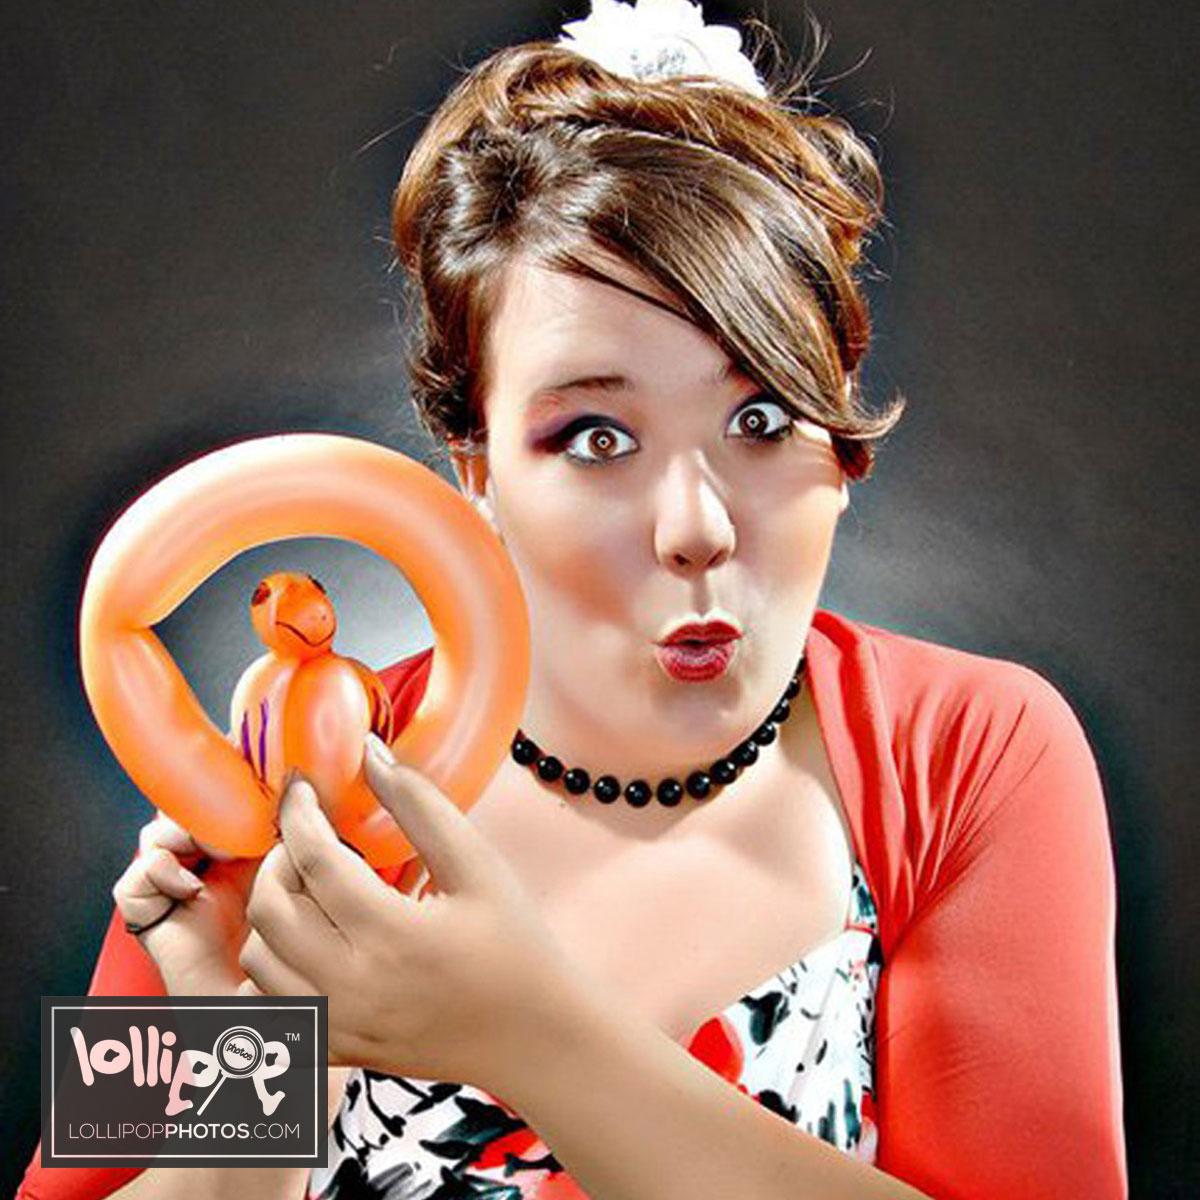 msdig-nora-canfield-lollipop-photos-063.jpg